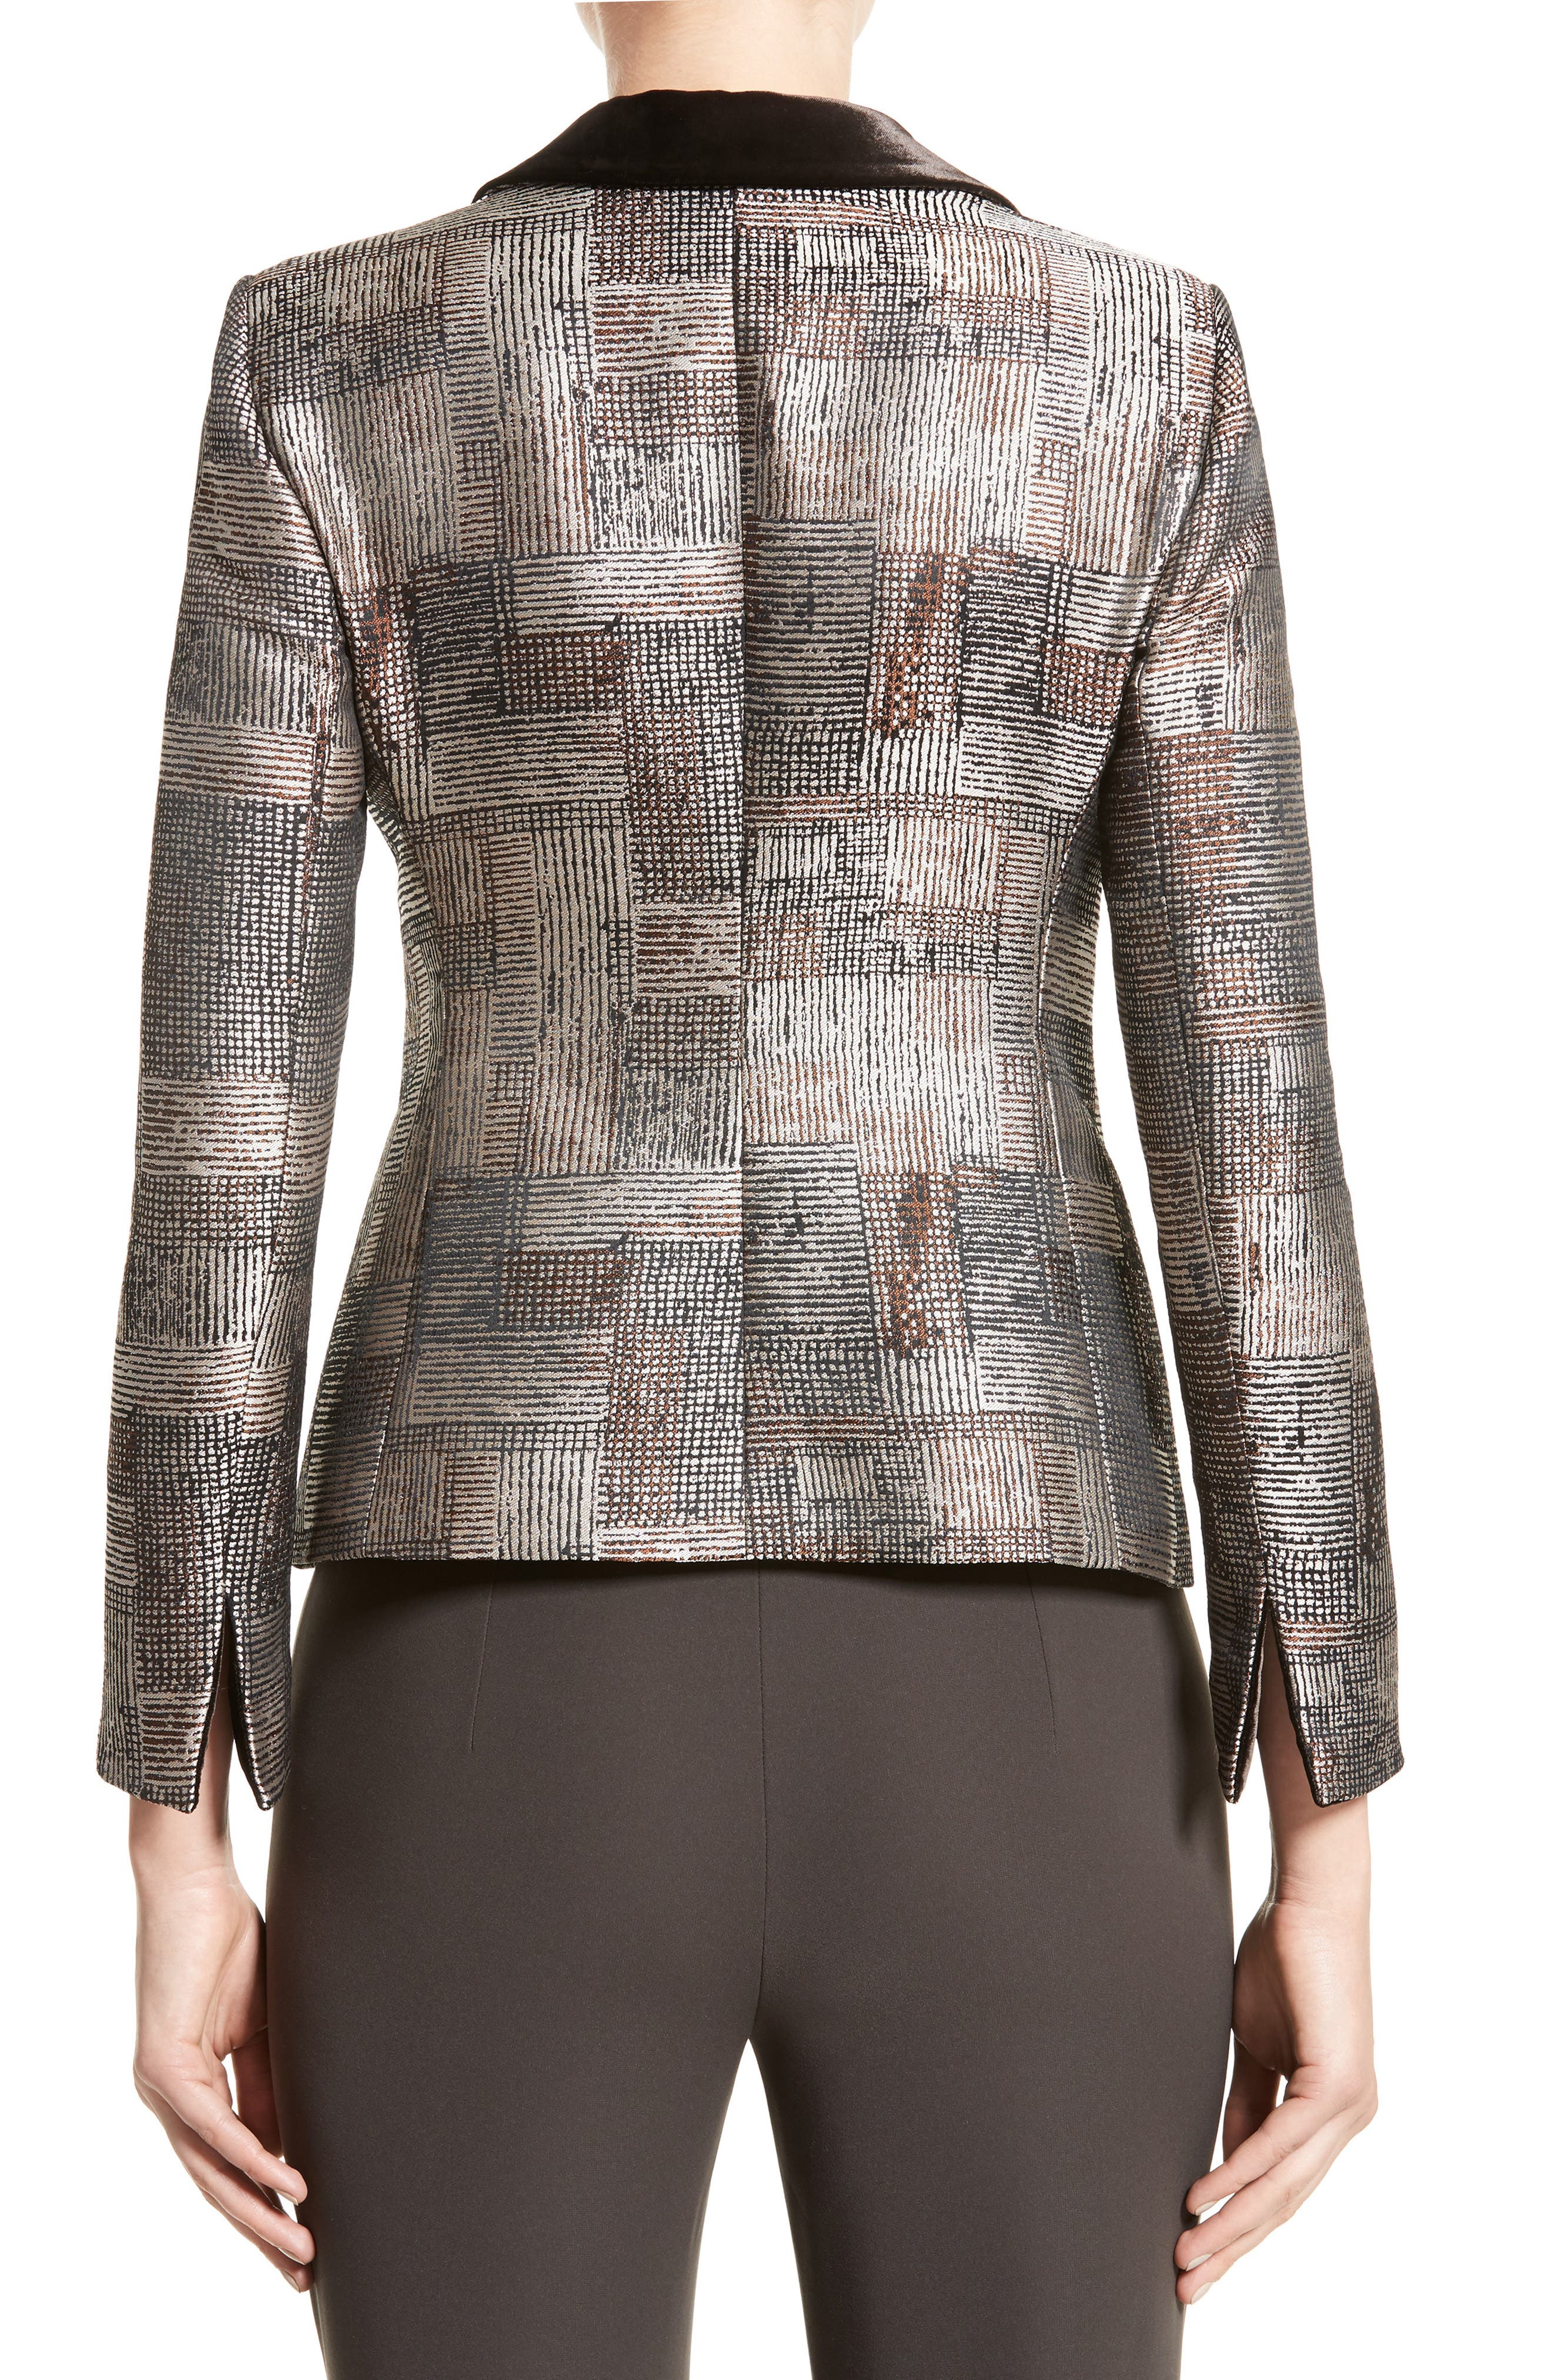 Alternate Image 2  - Armani Collezioni Panel Jacquard Asymmetrical Jacket